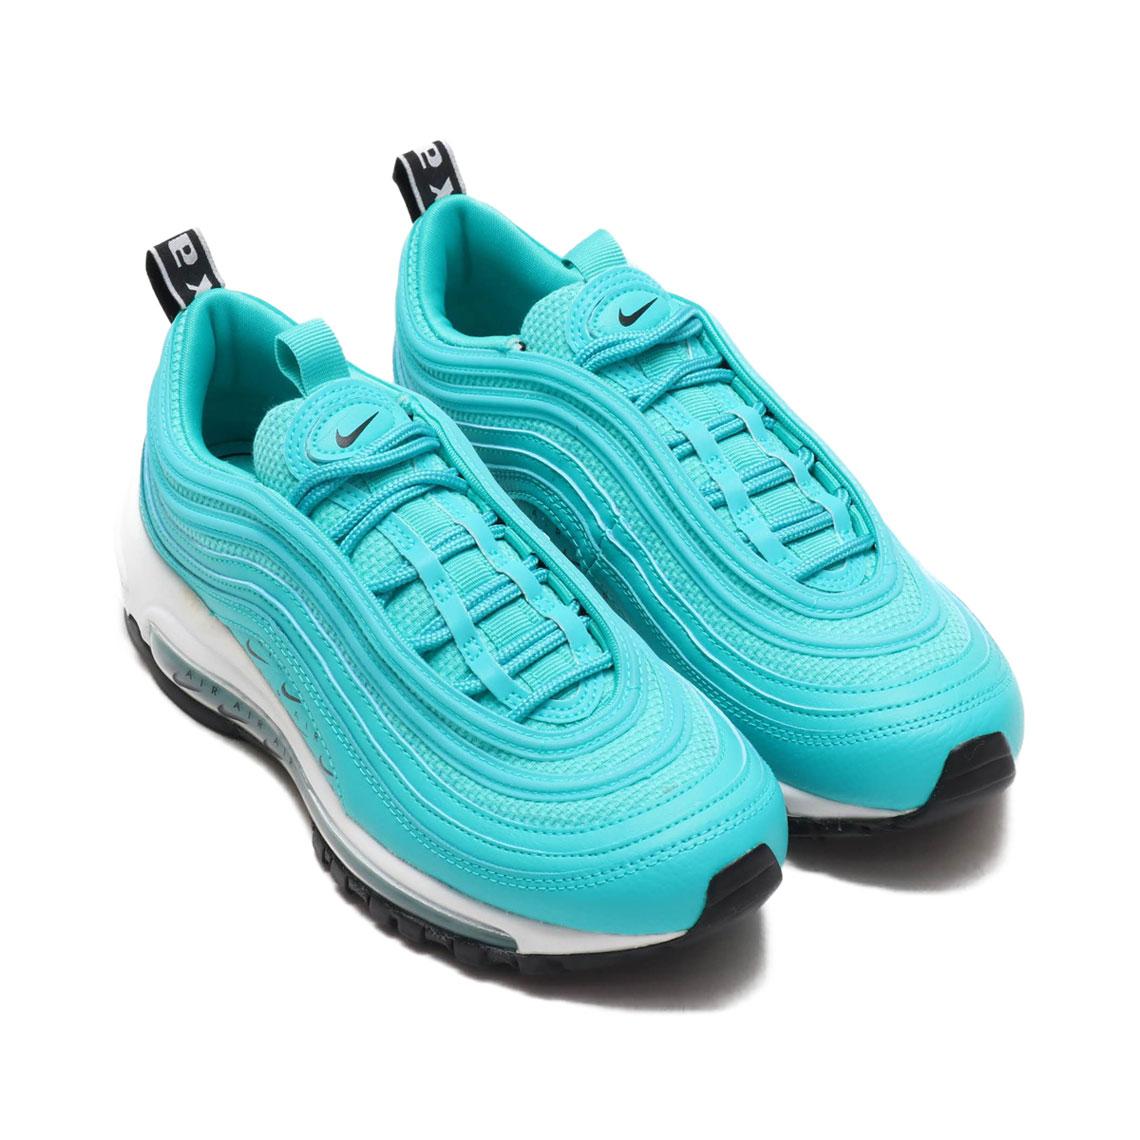 brand new 8a82a ab6a6 Nike Air Max 97 Hyper Jade AR7621-300   SneakerNews.com